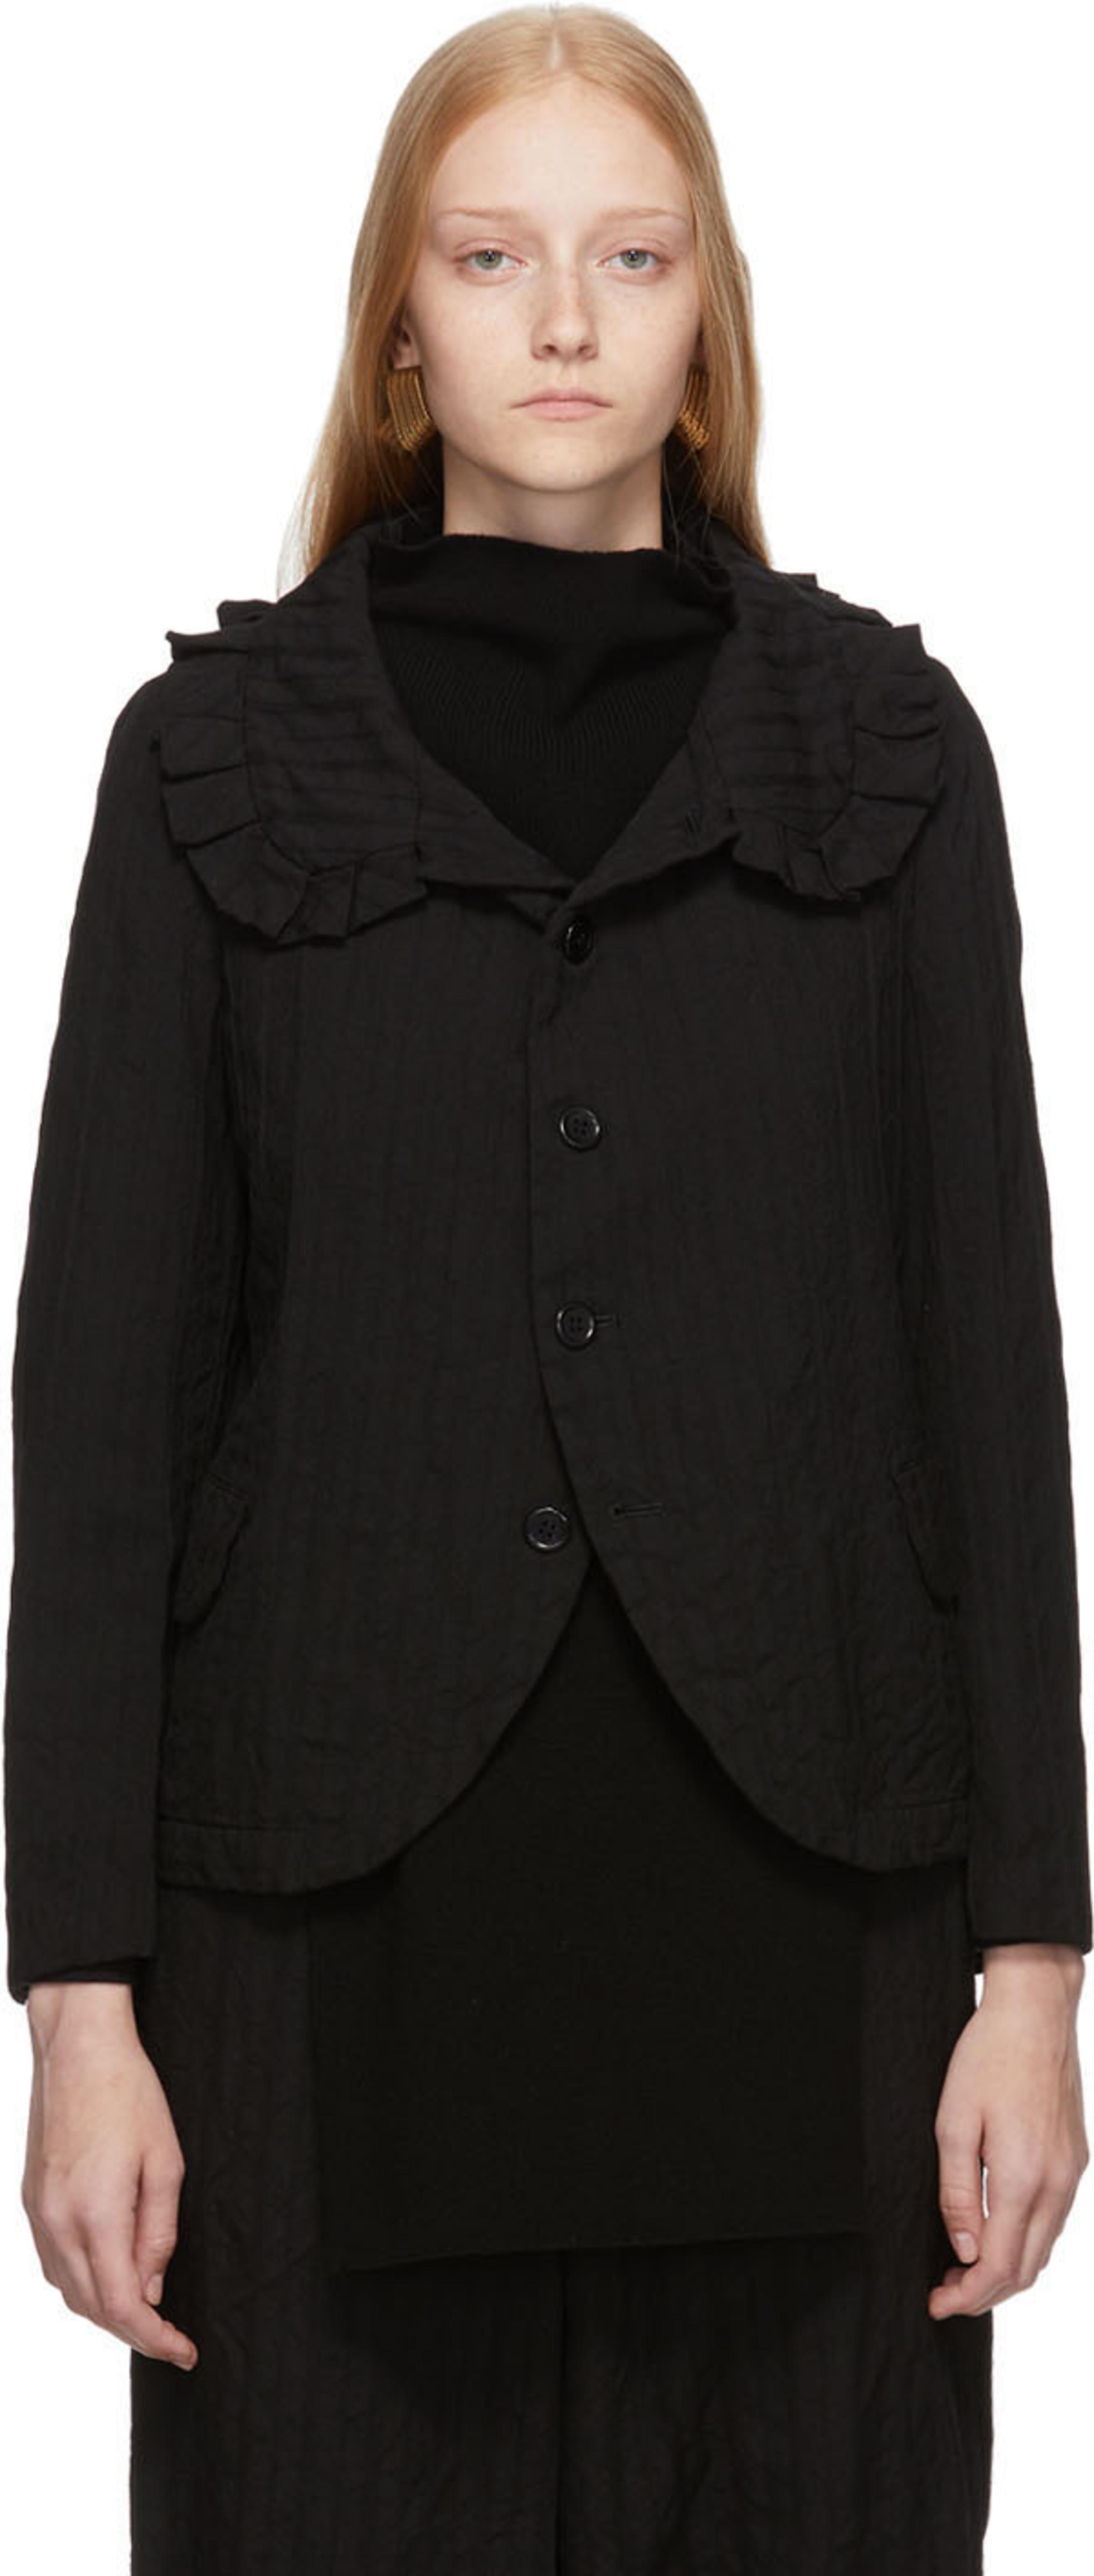 1641906af5 Black Dobby Stripe A Pattern Jacket